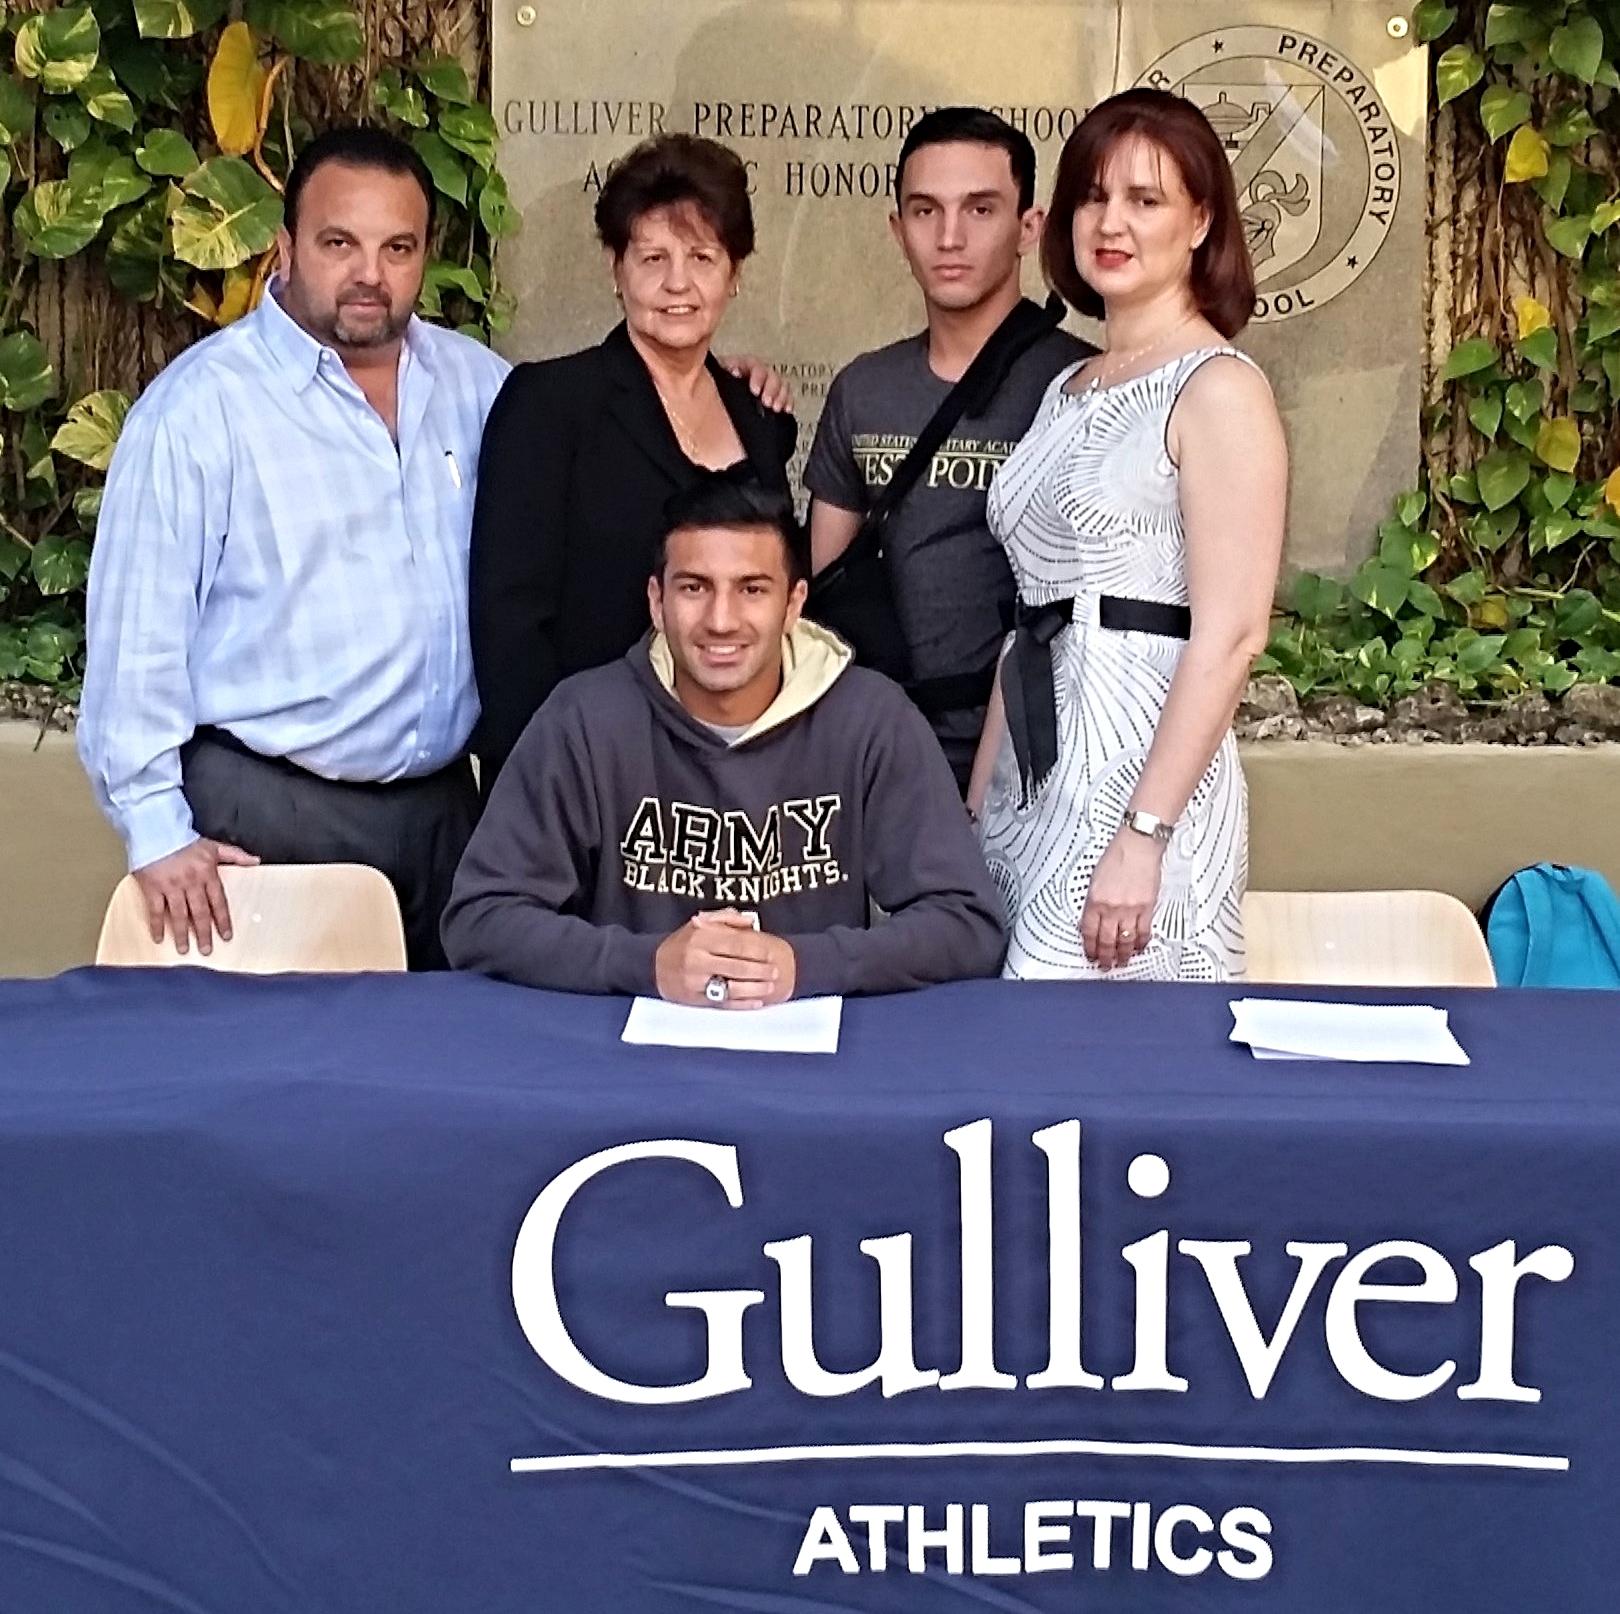 The Alvarez Familyon National Signing Day(Left to right: Abraham Alvarez, Julia Hernandez, Bryan Alvarez, and Sandra Alvarez)